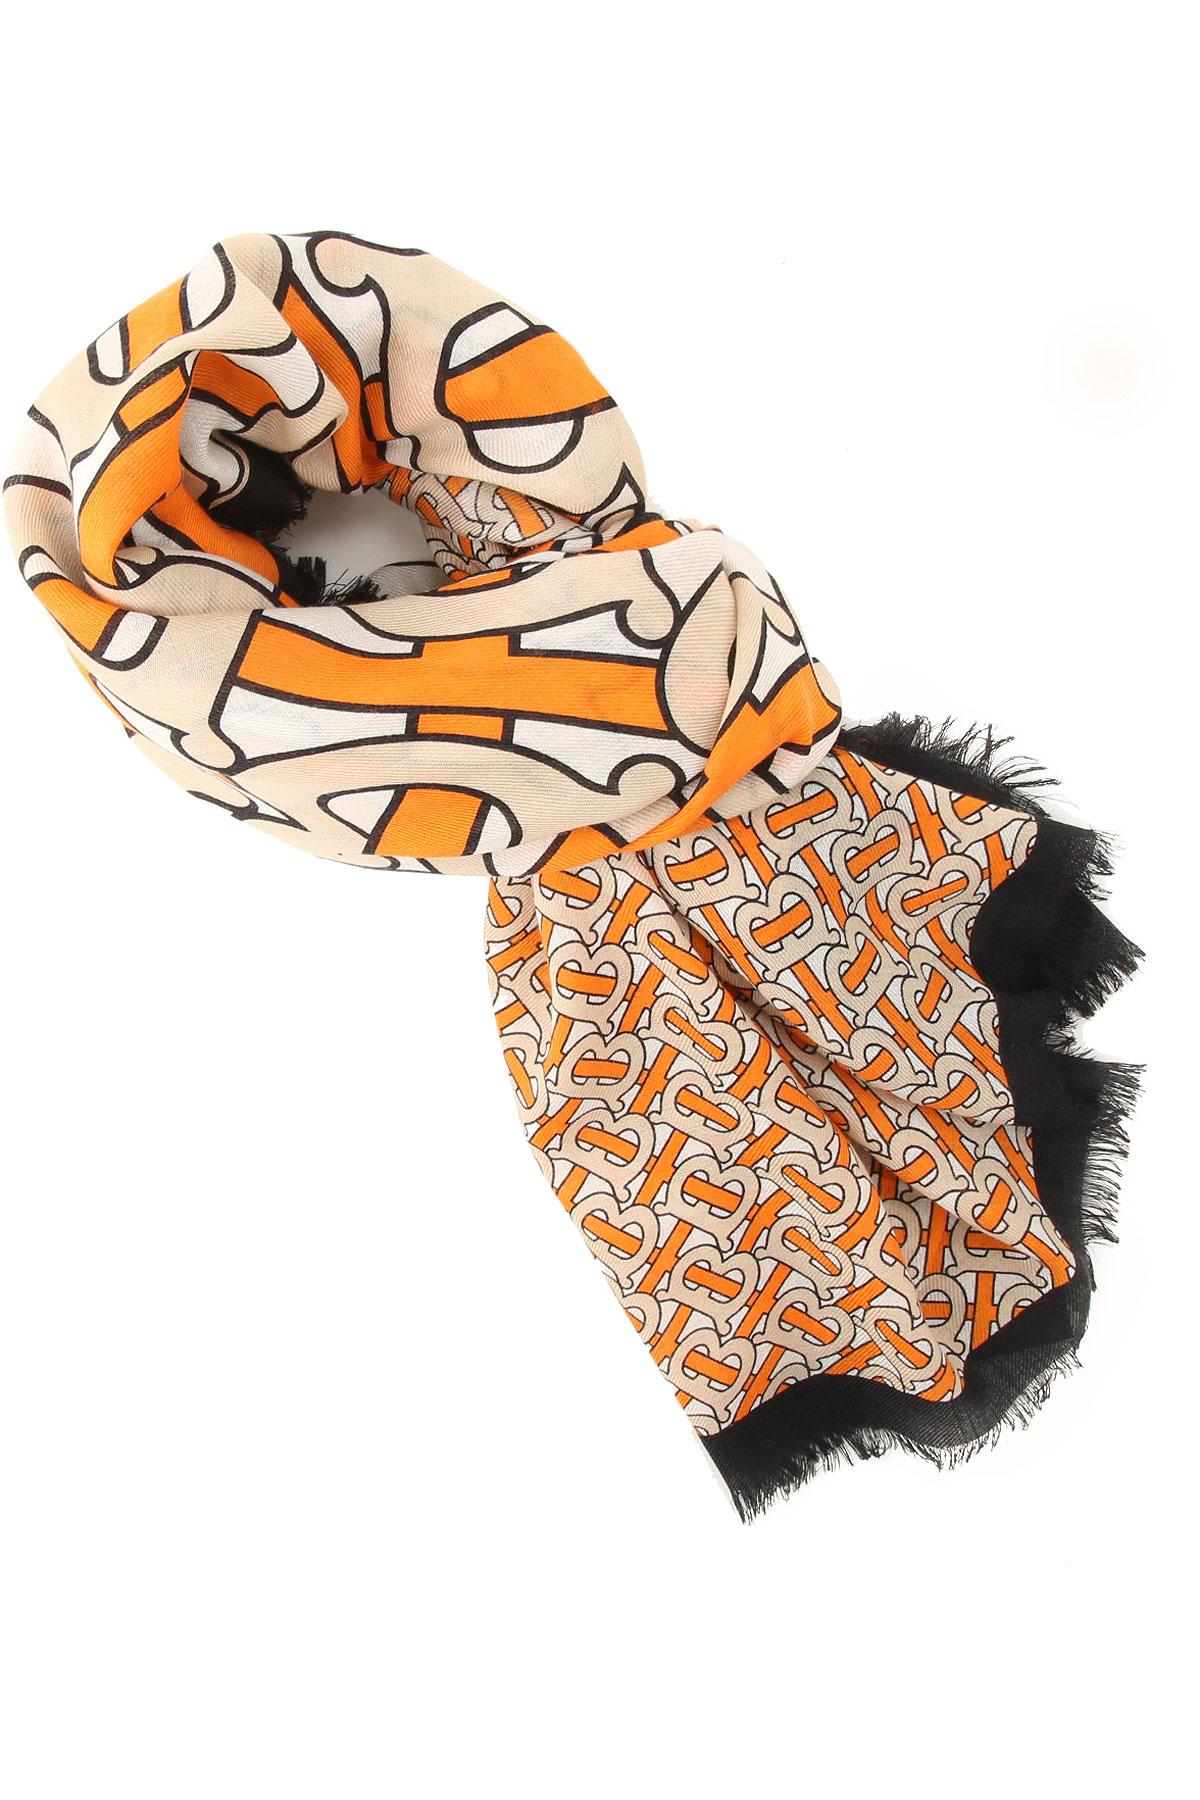 Burberry Wallet for Women, Bright Orange, Cashmere, 2019